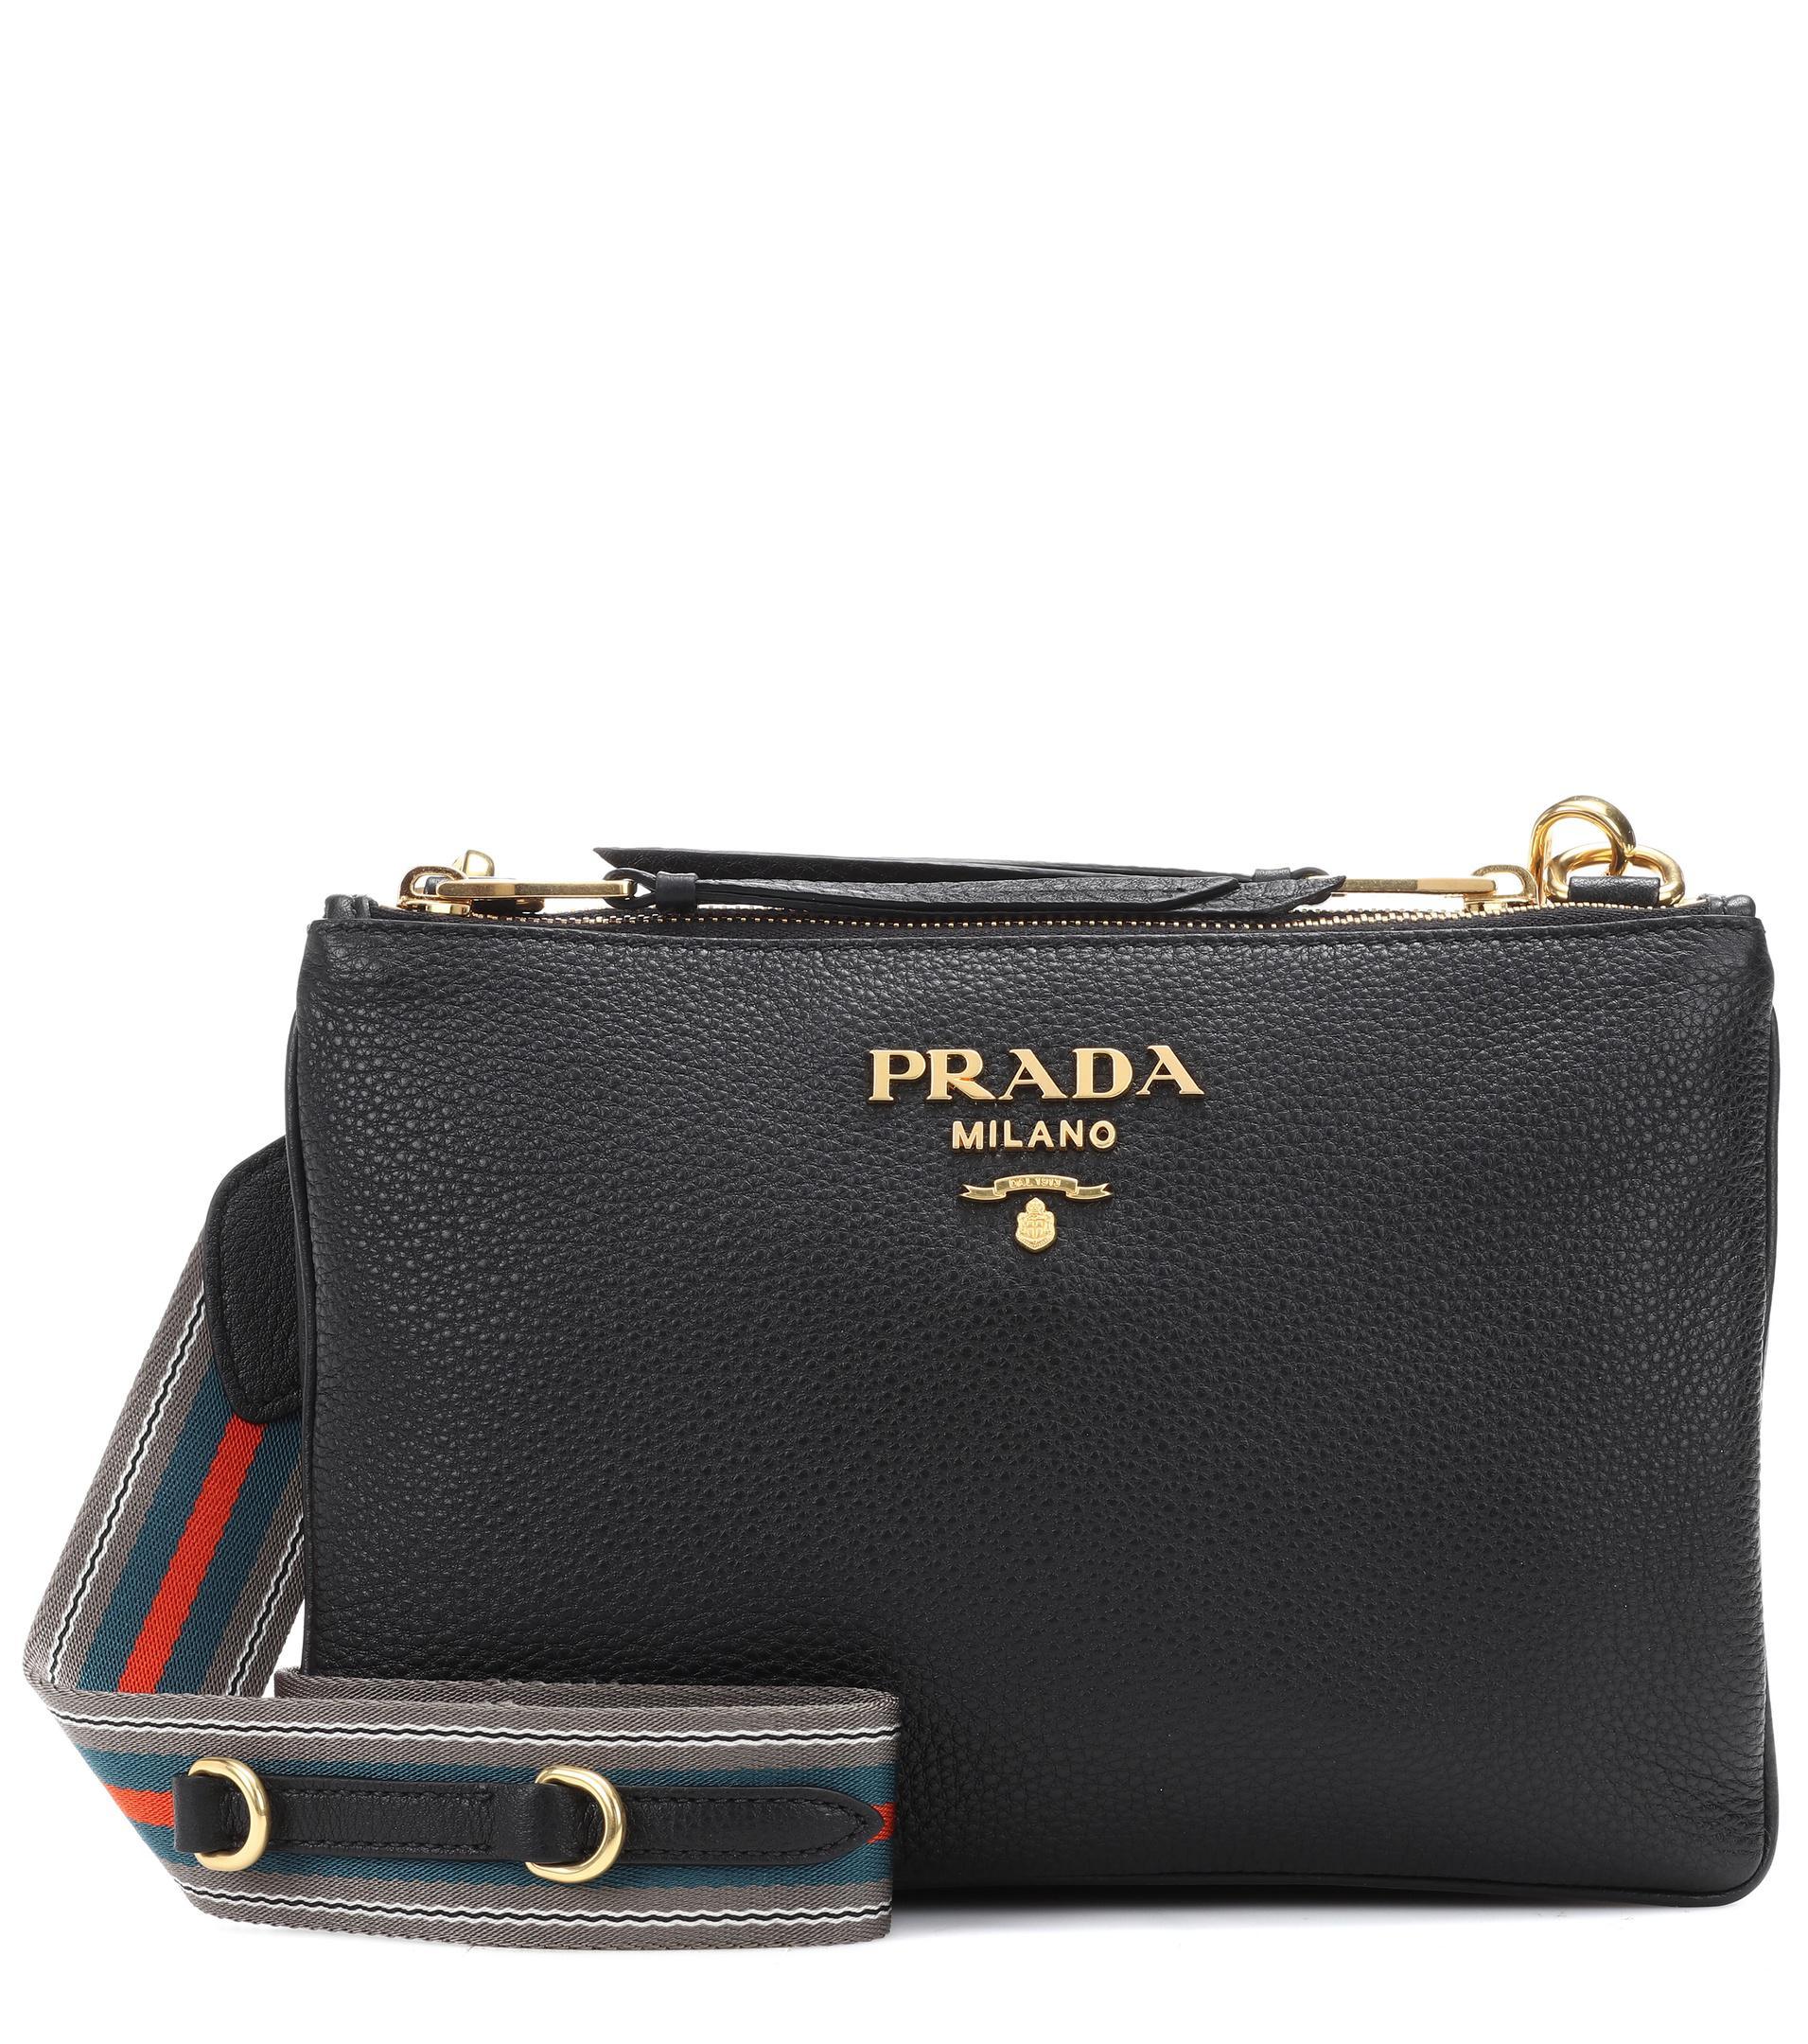 c9625adc4b ... buy prada black daino small leather crossbody bag lyst. view fullscreen  09319 462ef